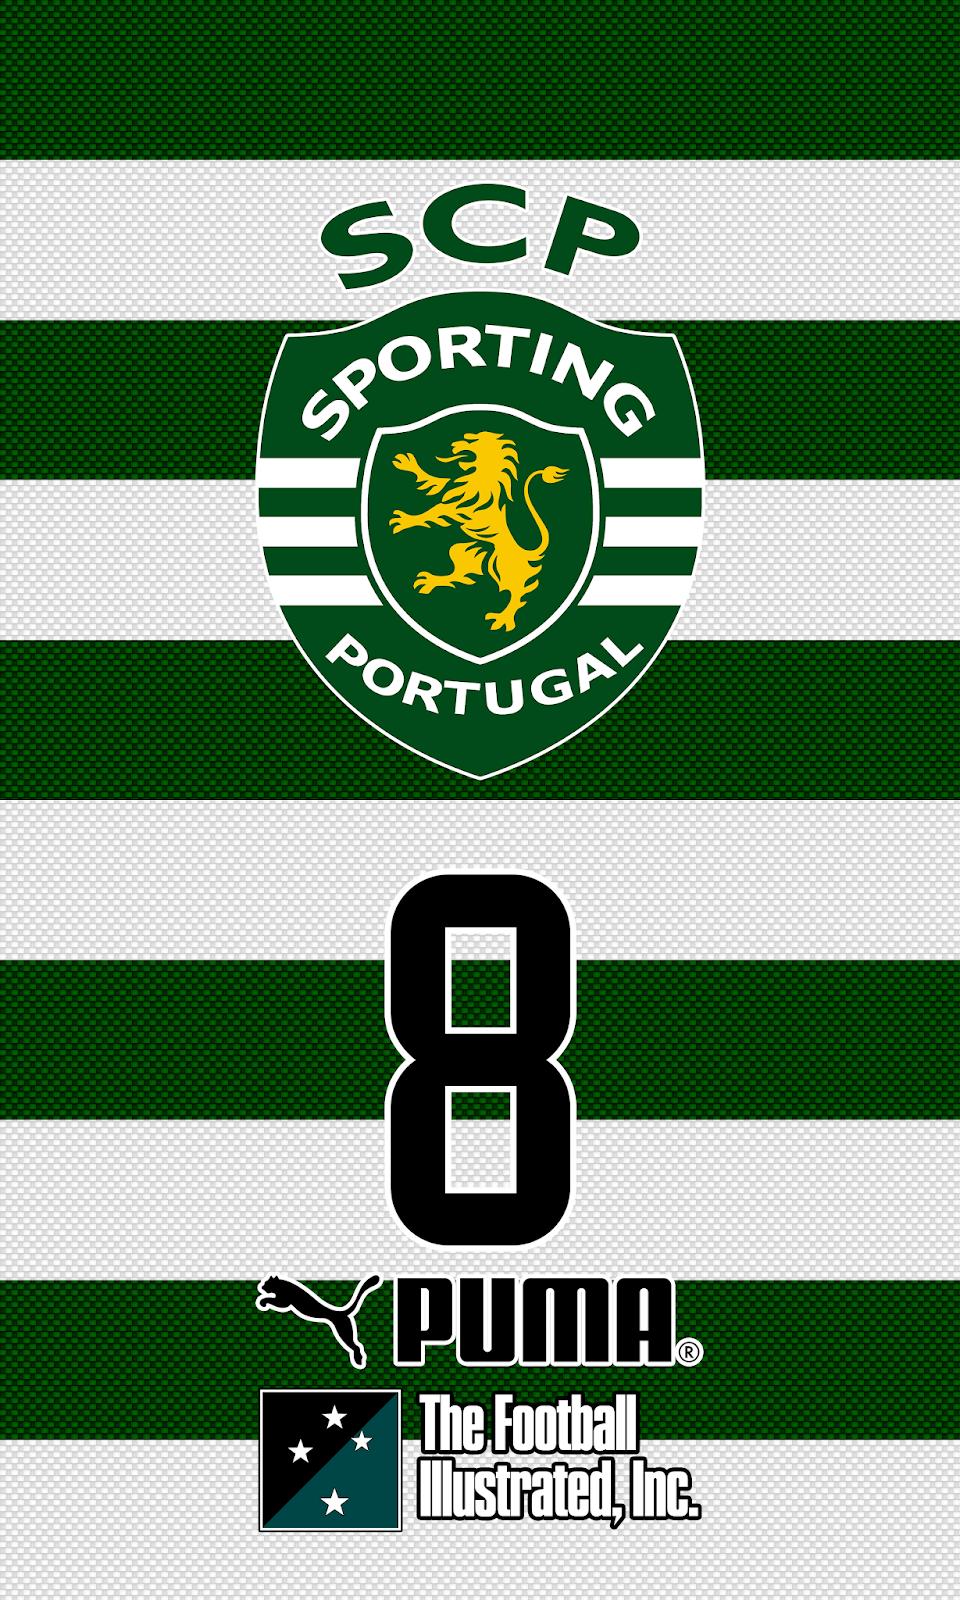 Sporting Clube De Portugal Sporting Clube De Portugal Sporting Clube Sporting